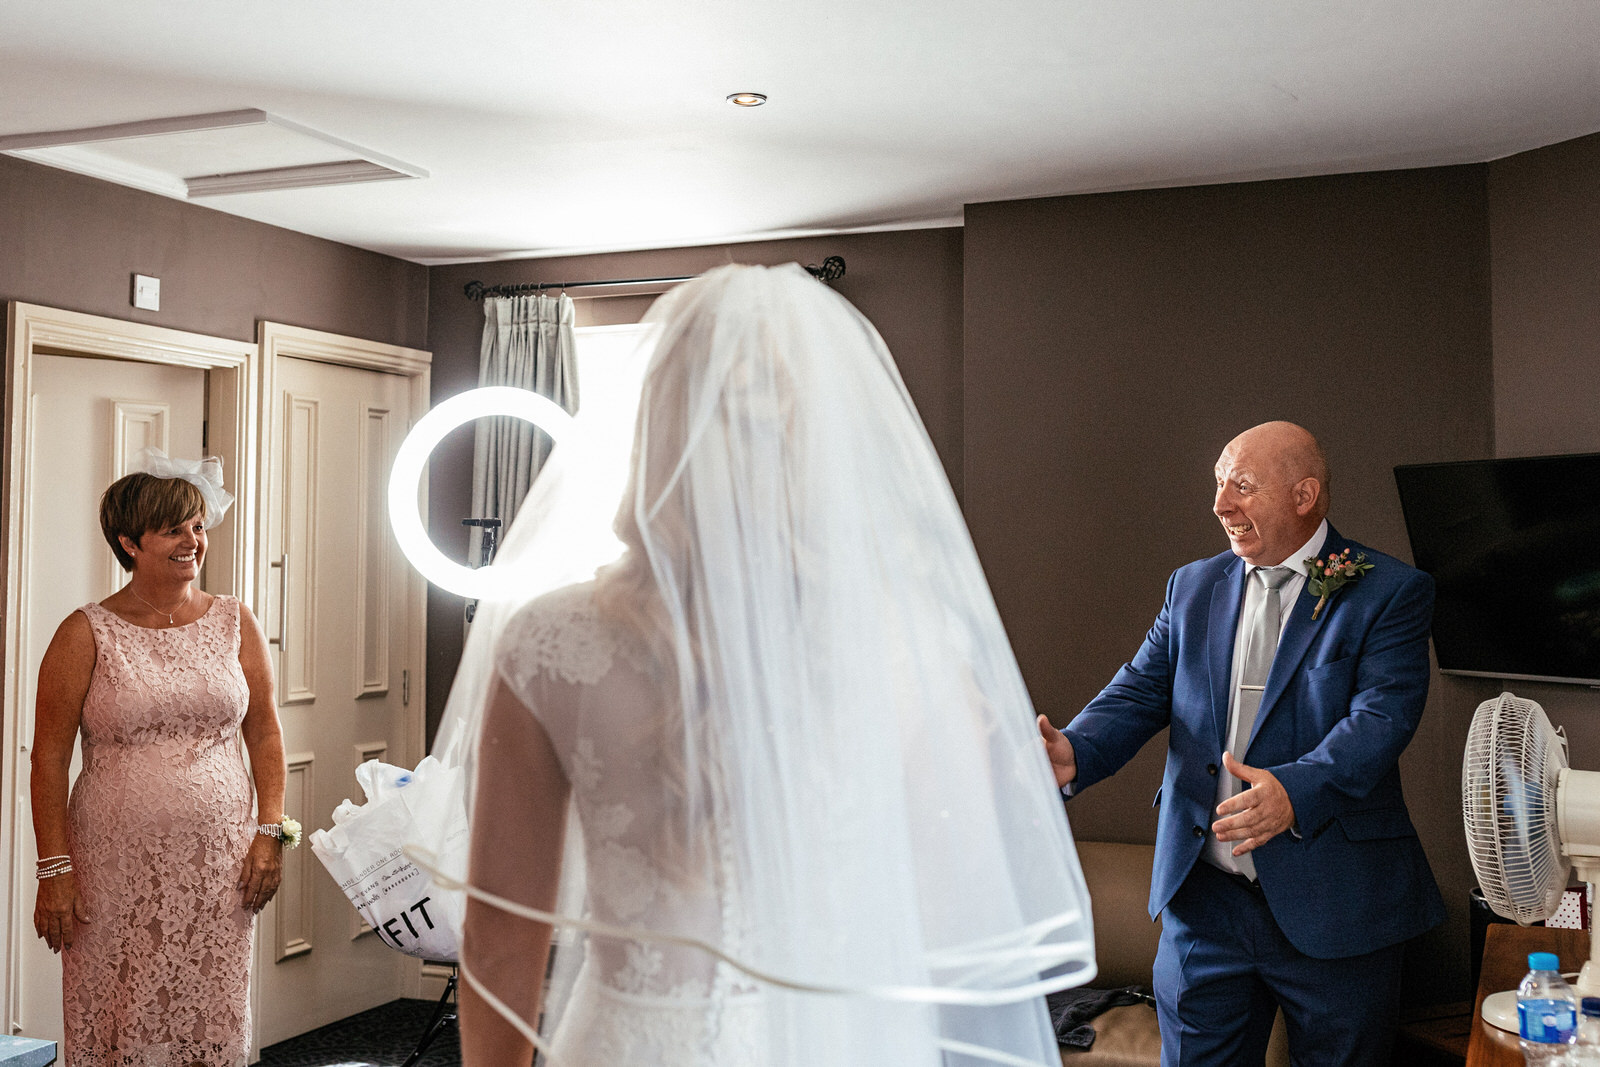 Moddershall-Oaks-Spa-Wedding-Photographer-010.jpg